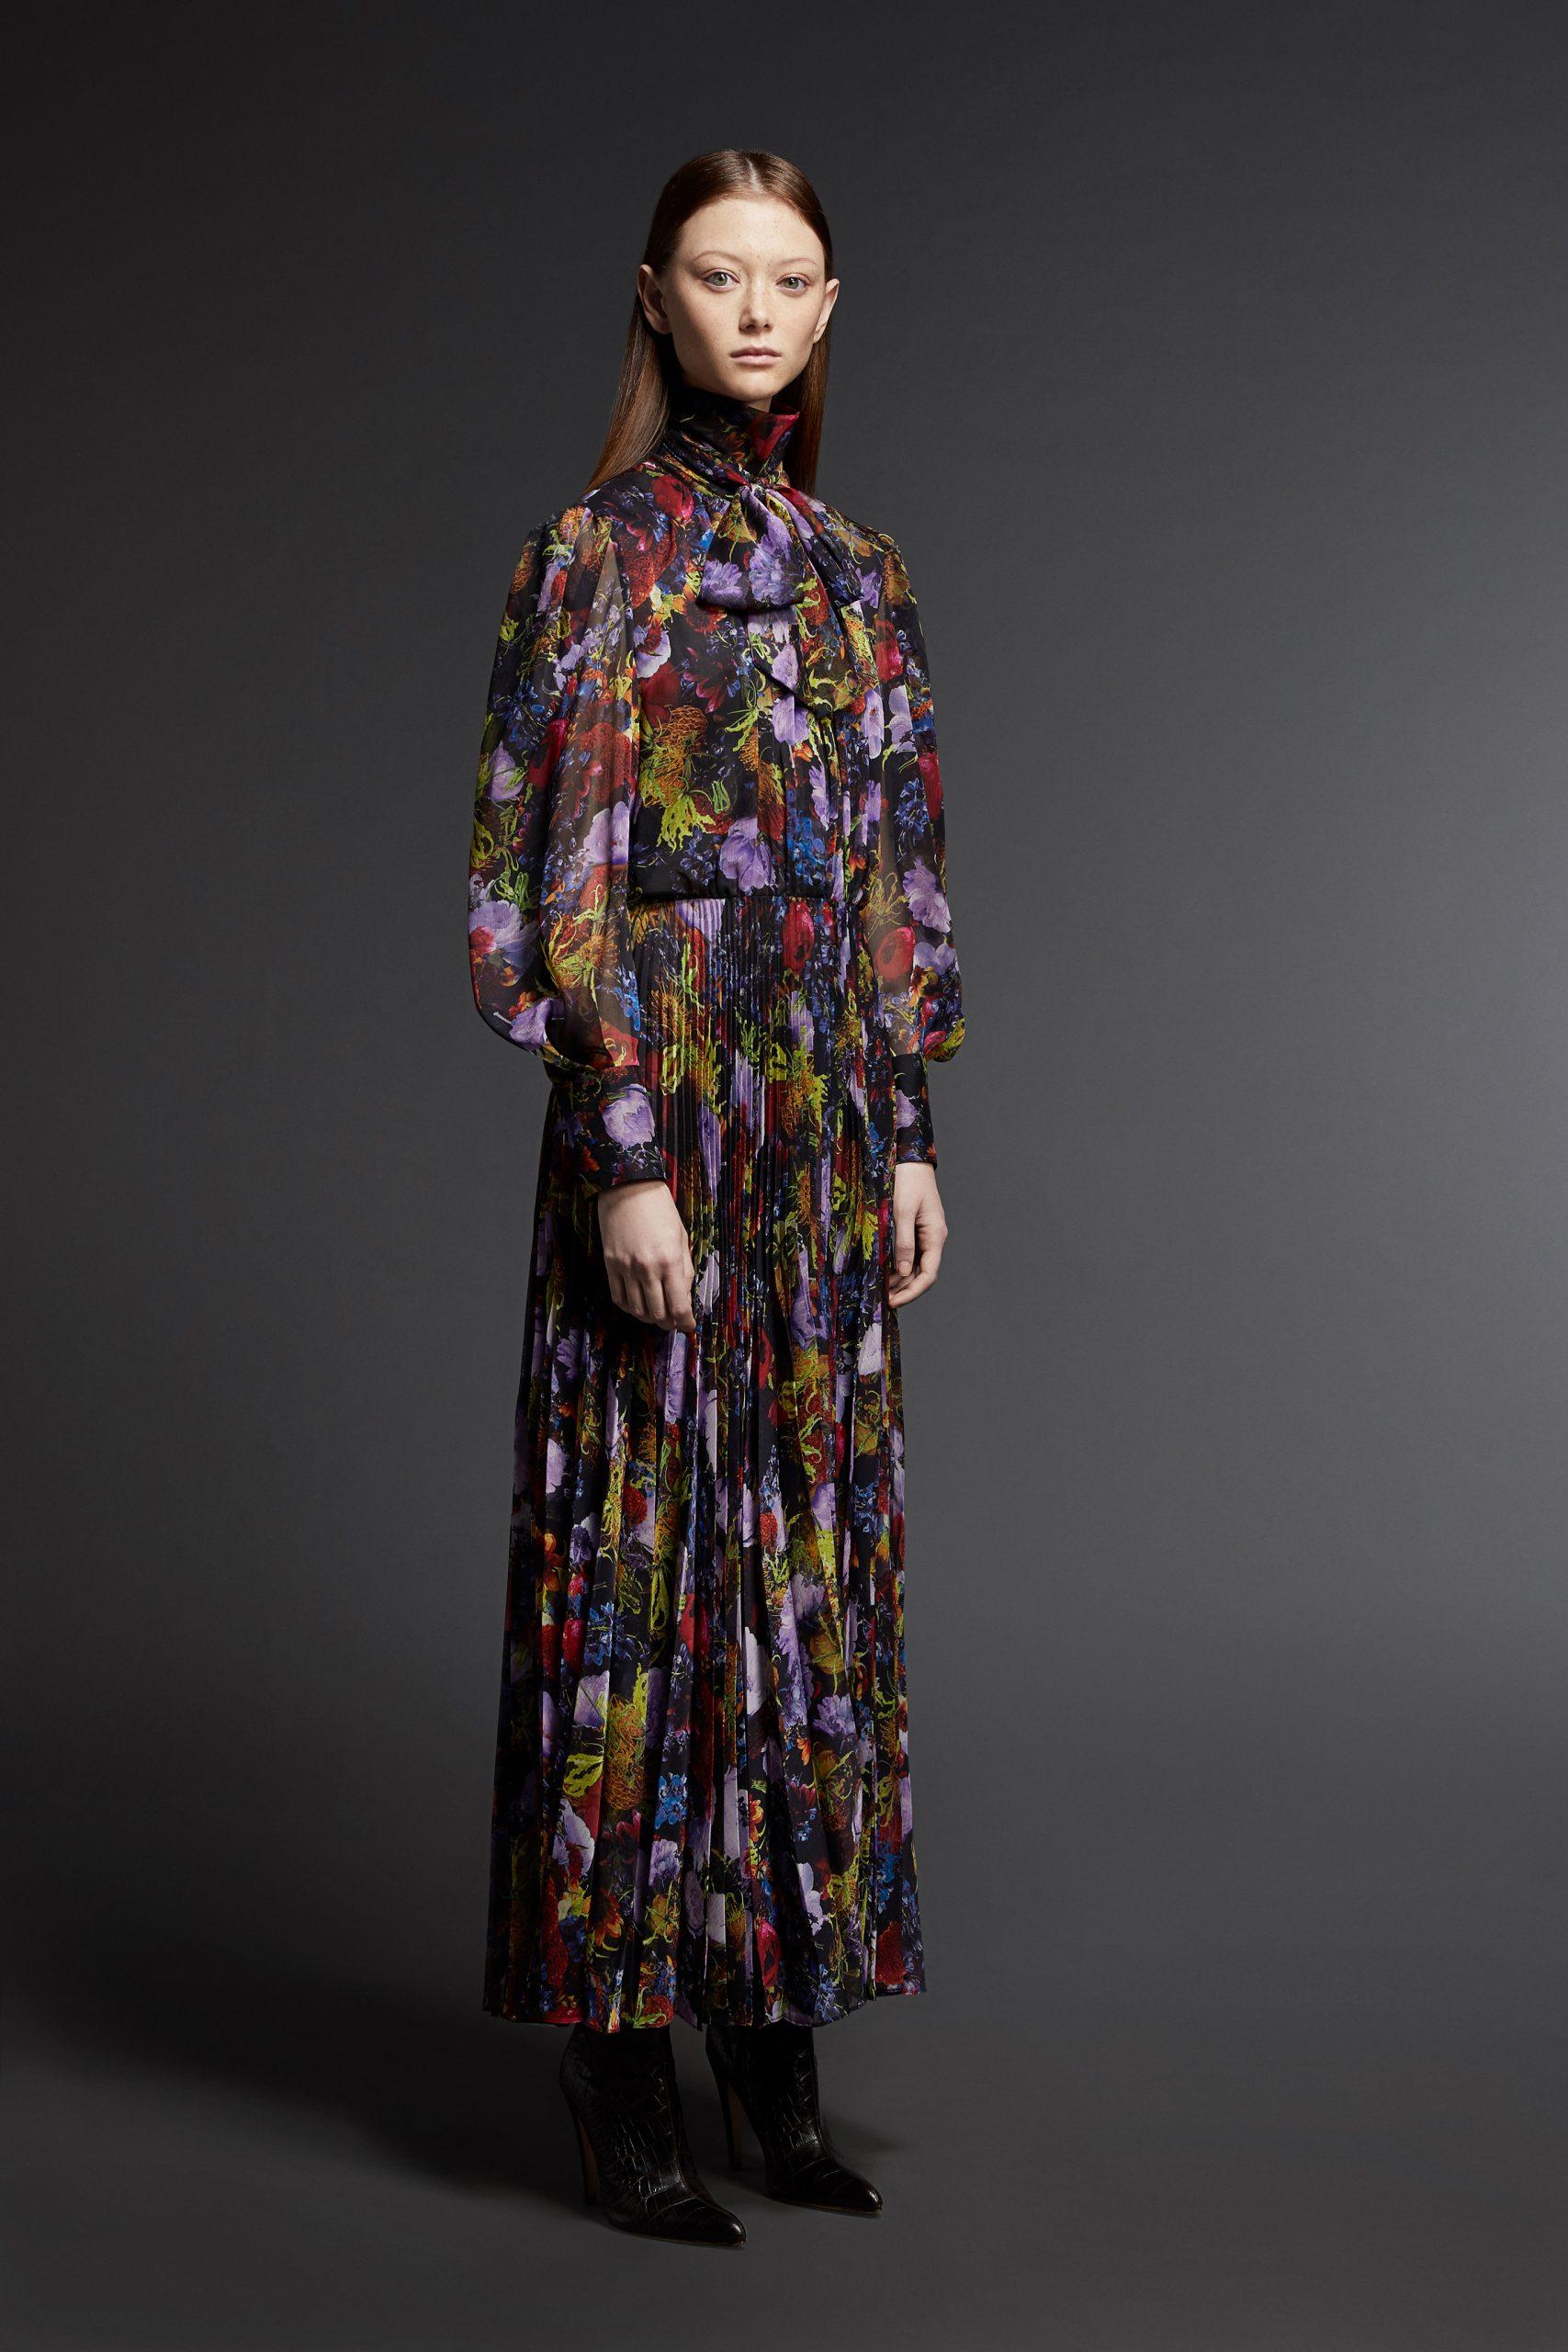 Jason Wu Collection Fall 2021 Fashion Show Photos